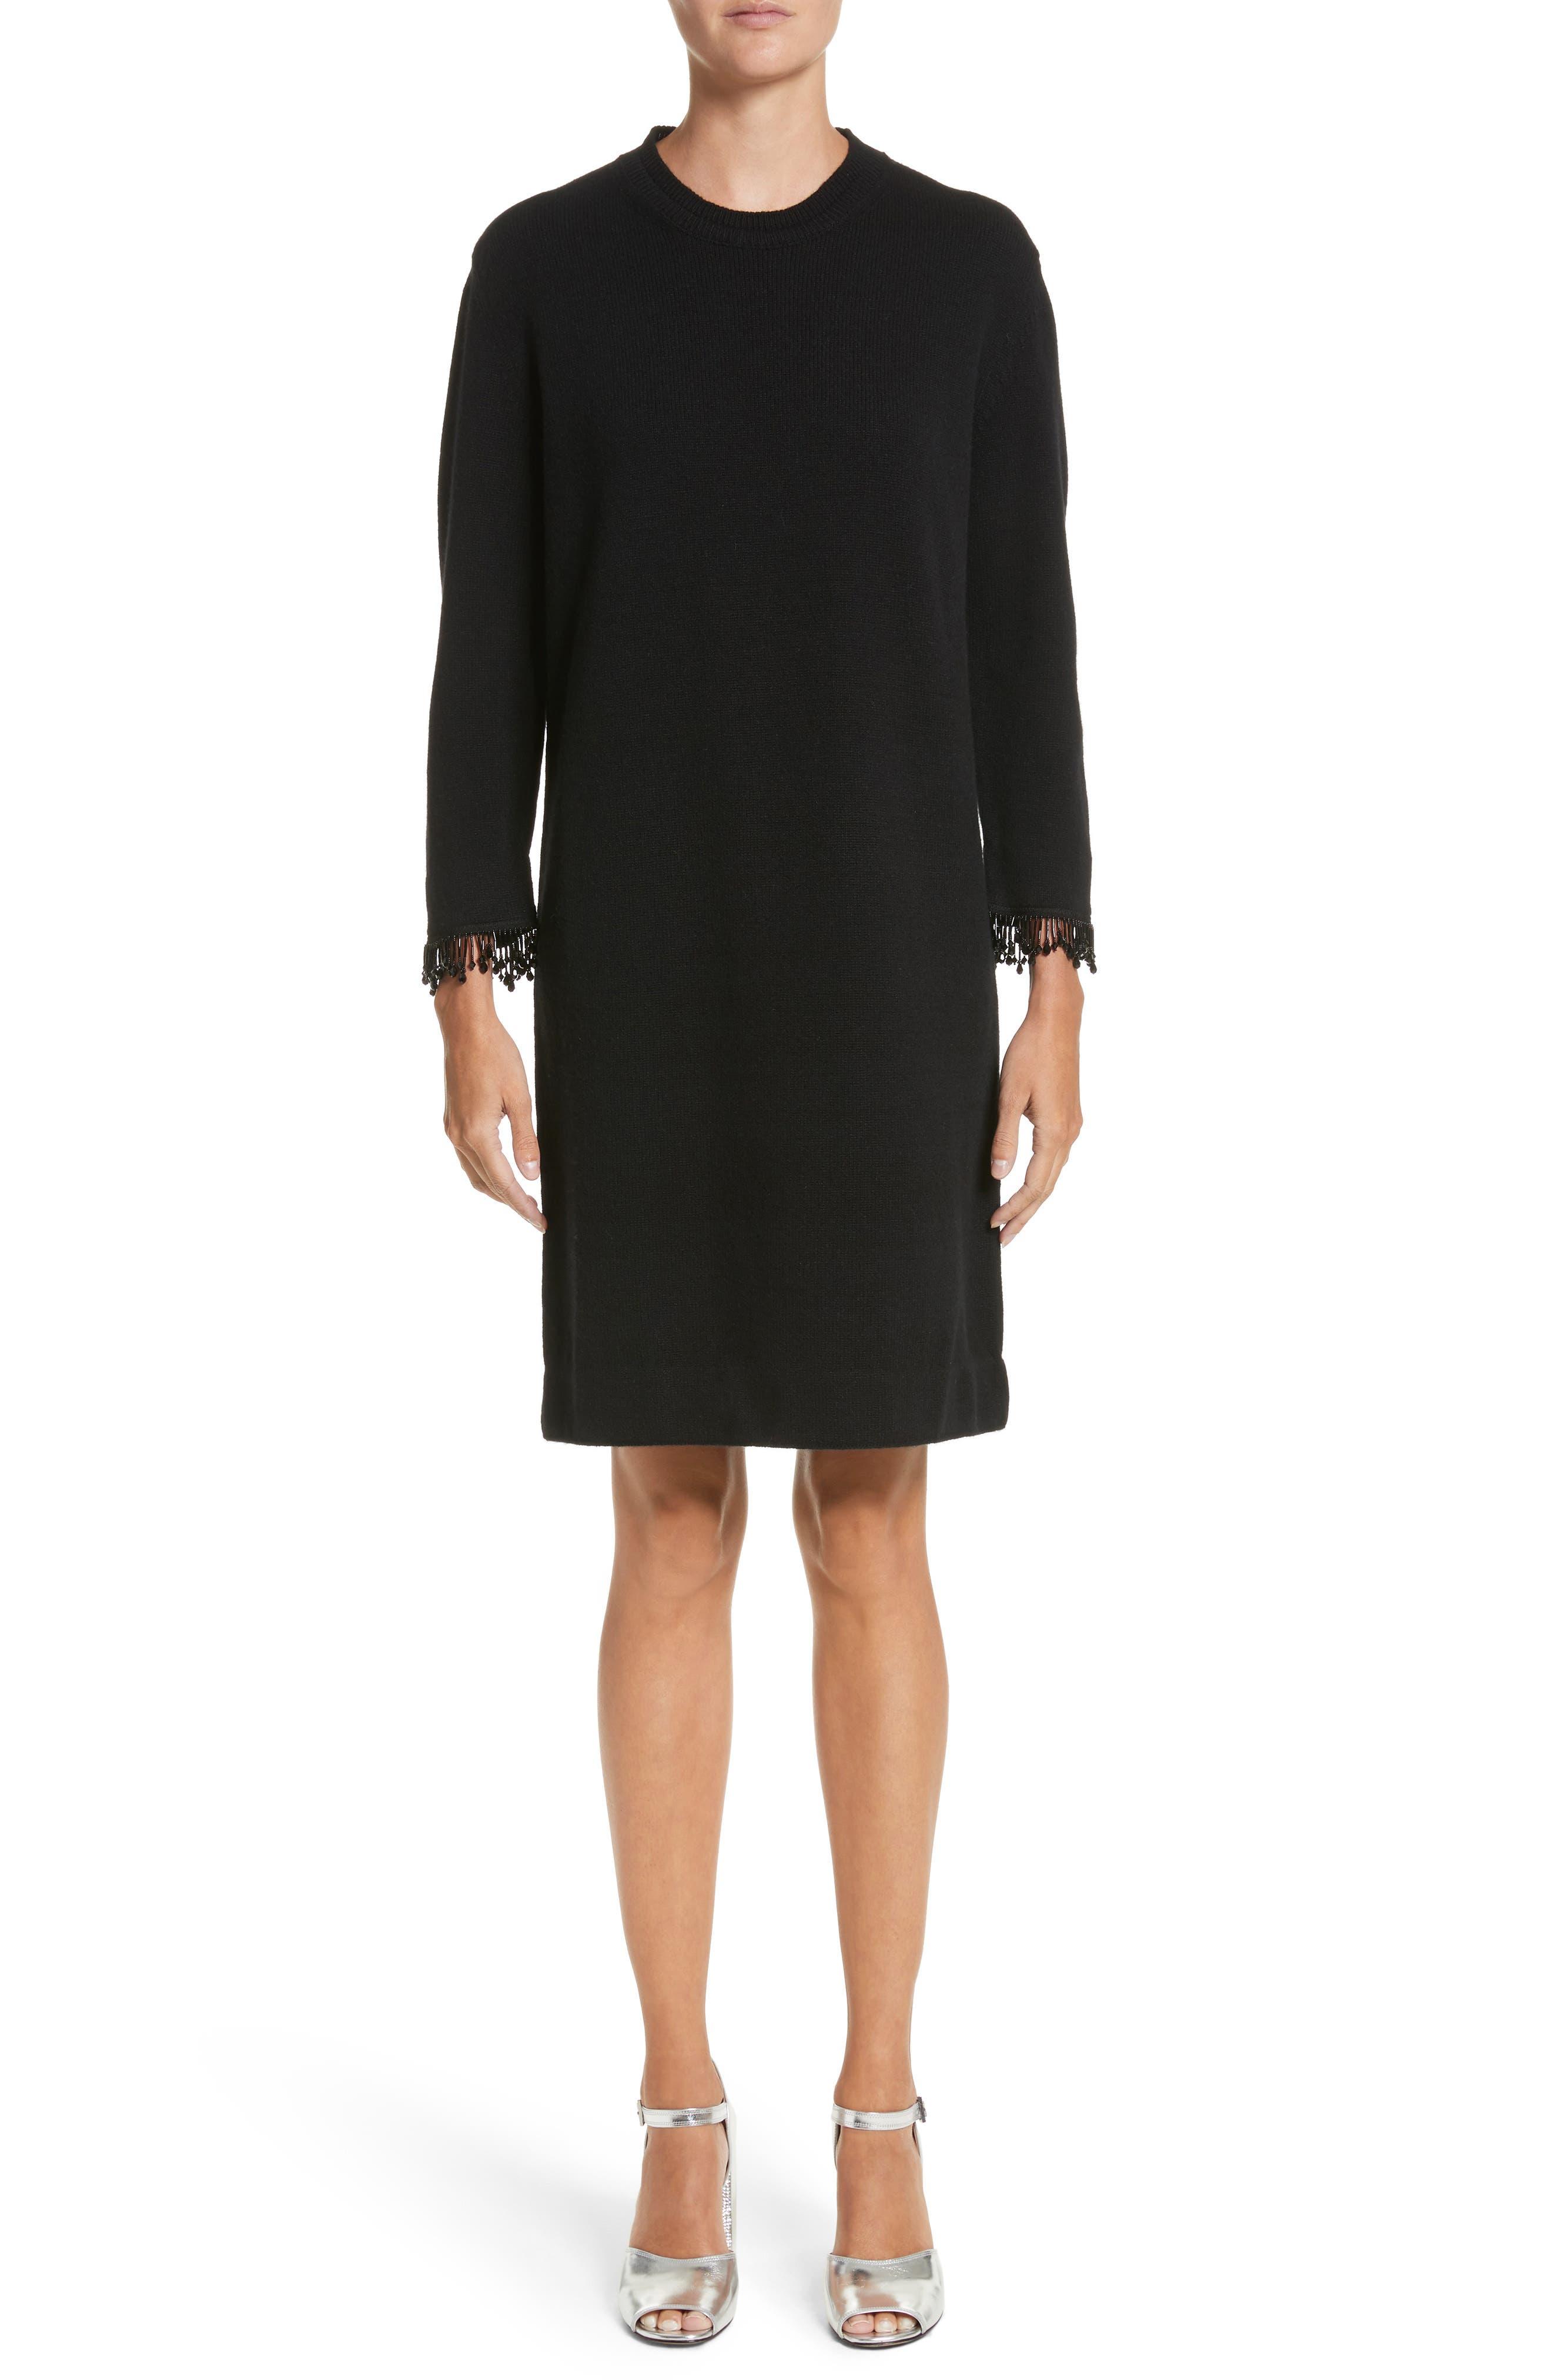 Main Image - MARC JACOBS Beaded Fringe Wool & Cashmere Dress